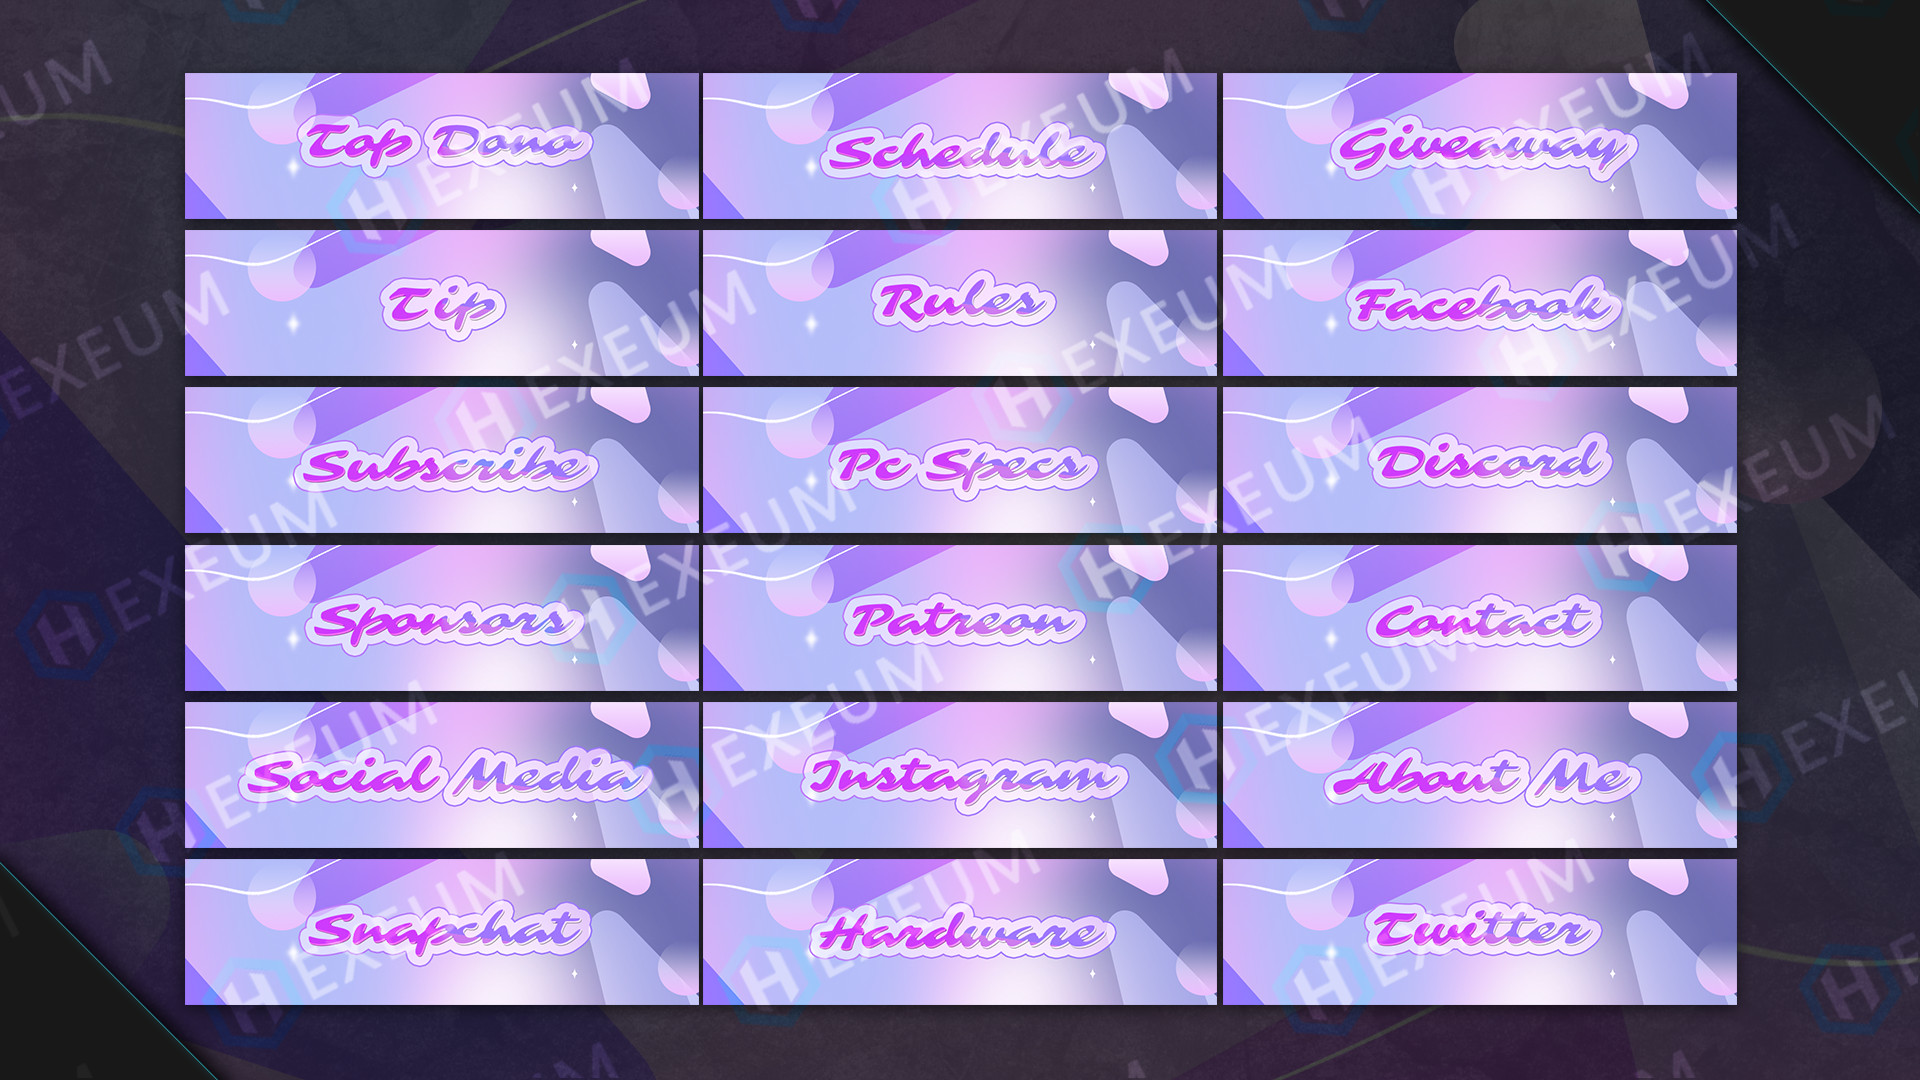 Dreamy Pink Twitch Panels